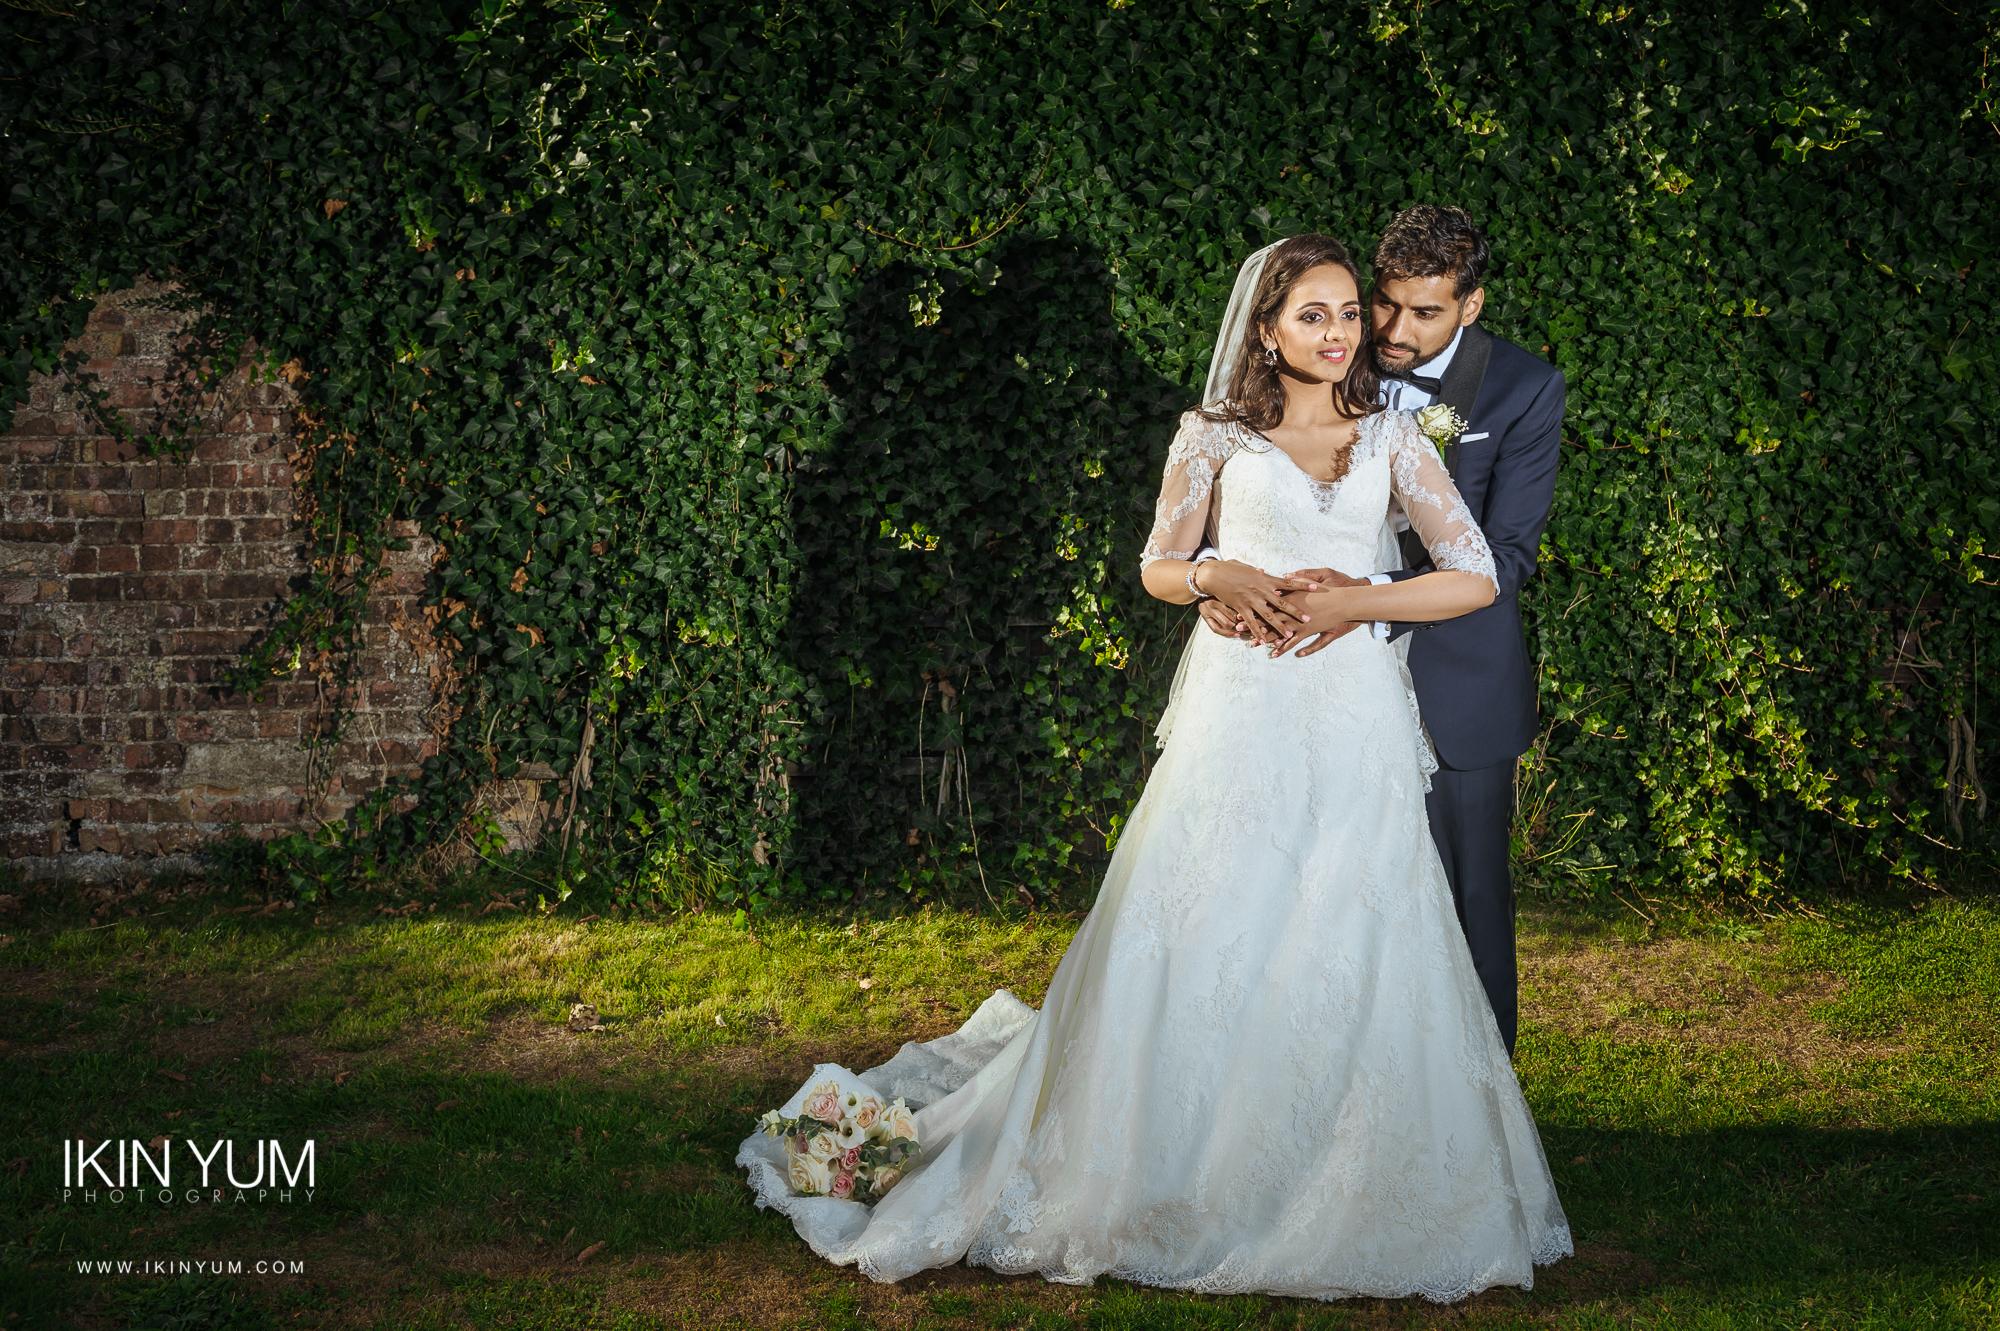 Laura Ashley Manor Wedding - Ikin Yum Photography-106.jpg